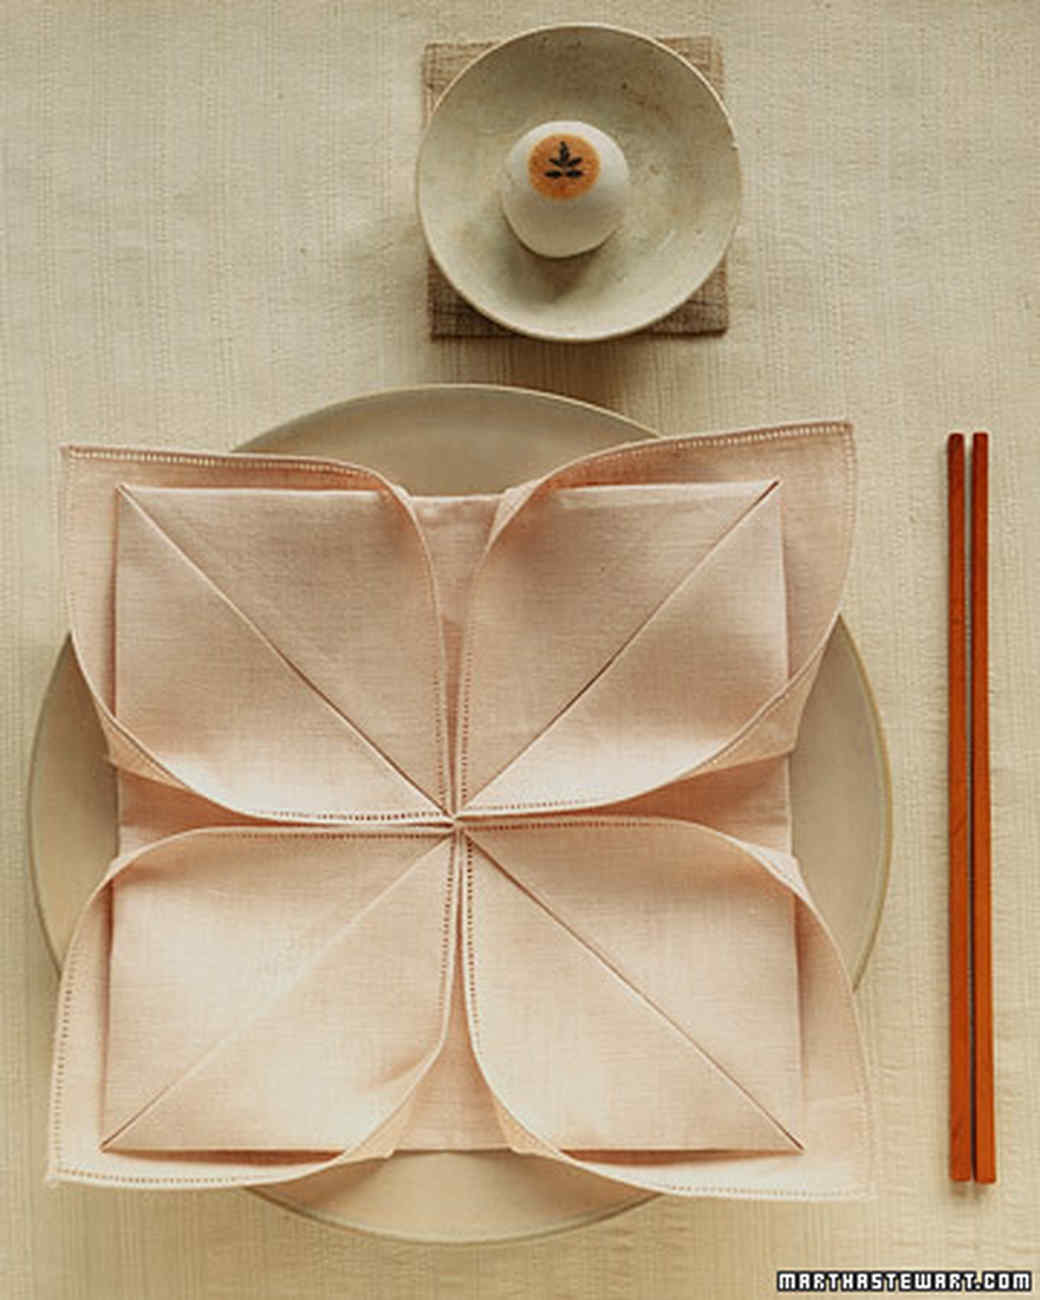 Napkin folding instructions for the pyramid napkin fold - Napkin Folding By Luigi Spotorno Pos Sector Napkinfolding Ideas Martha Stewart